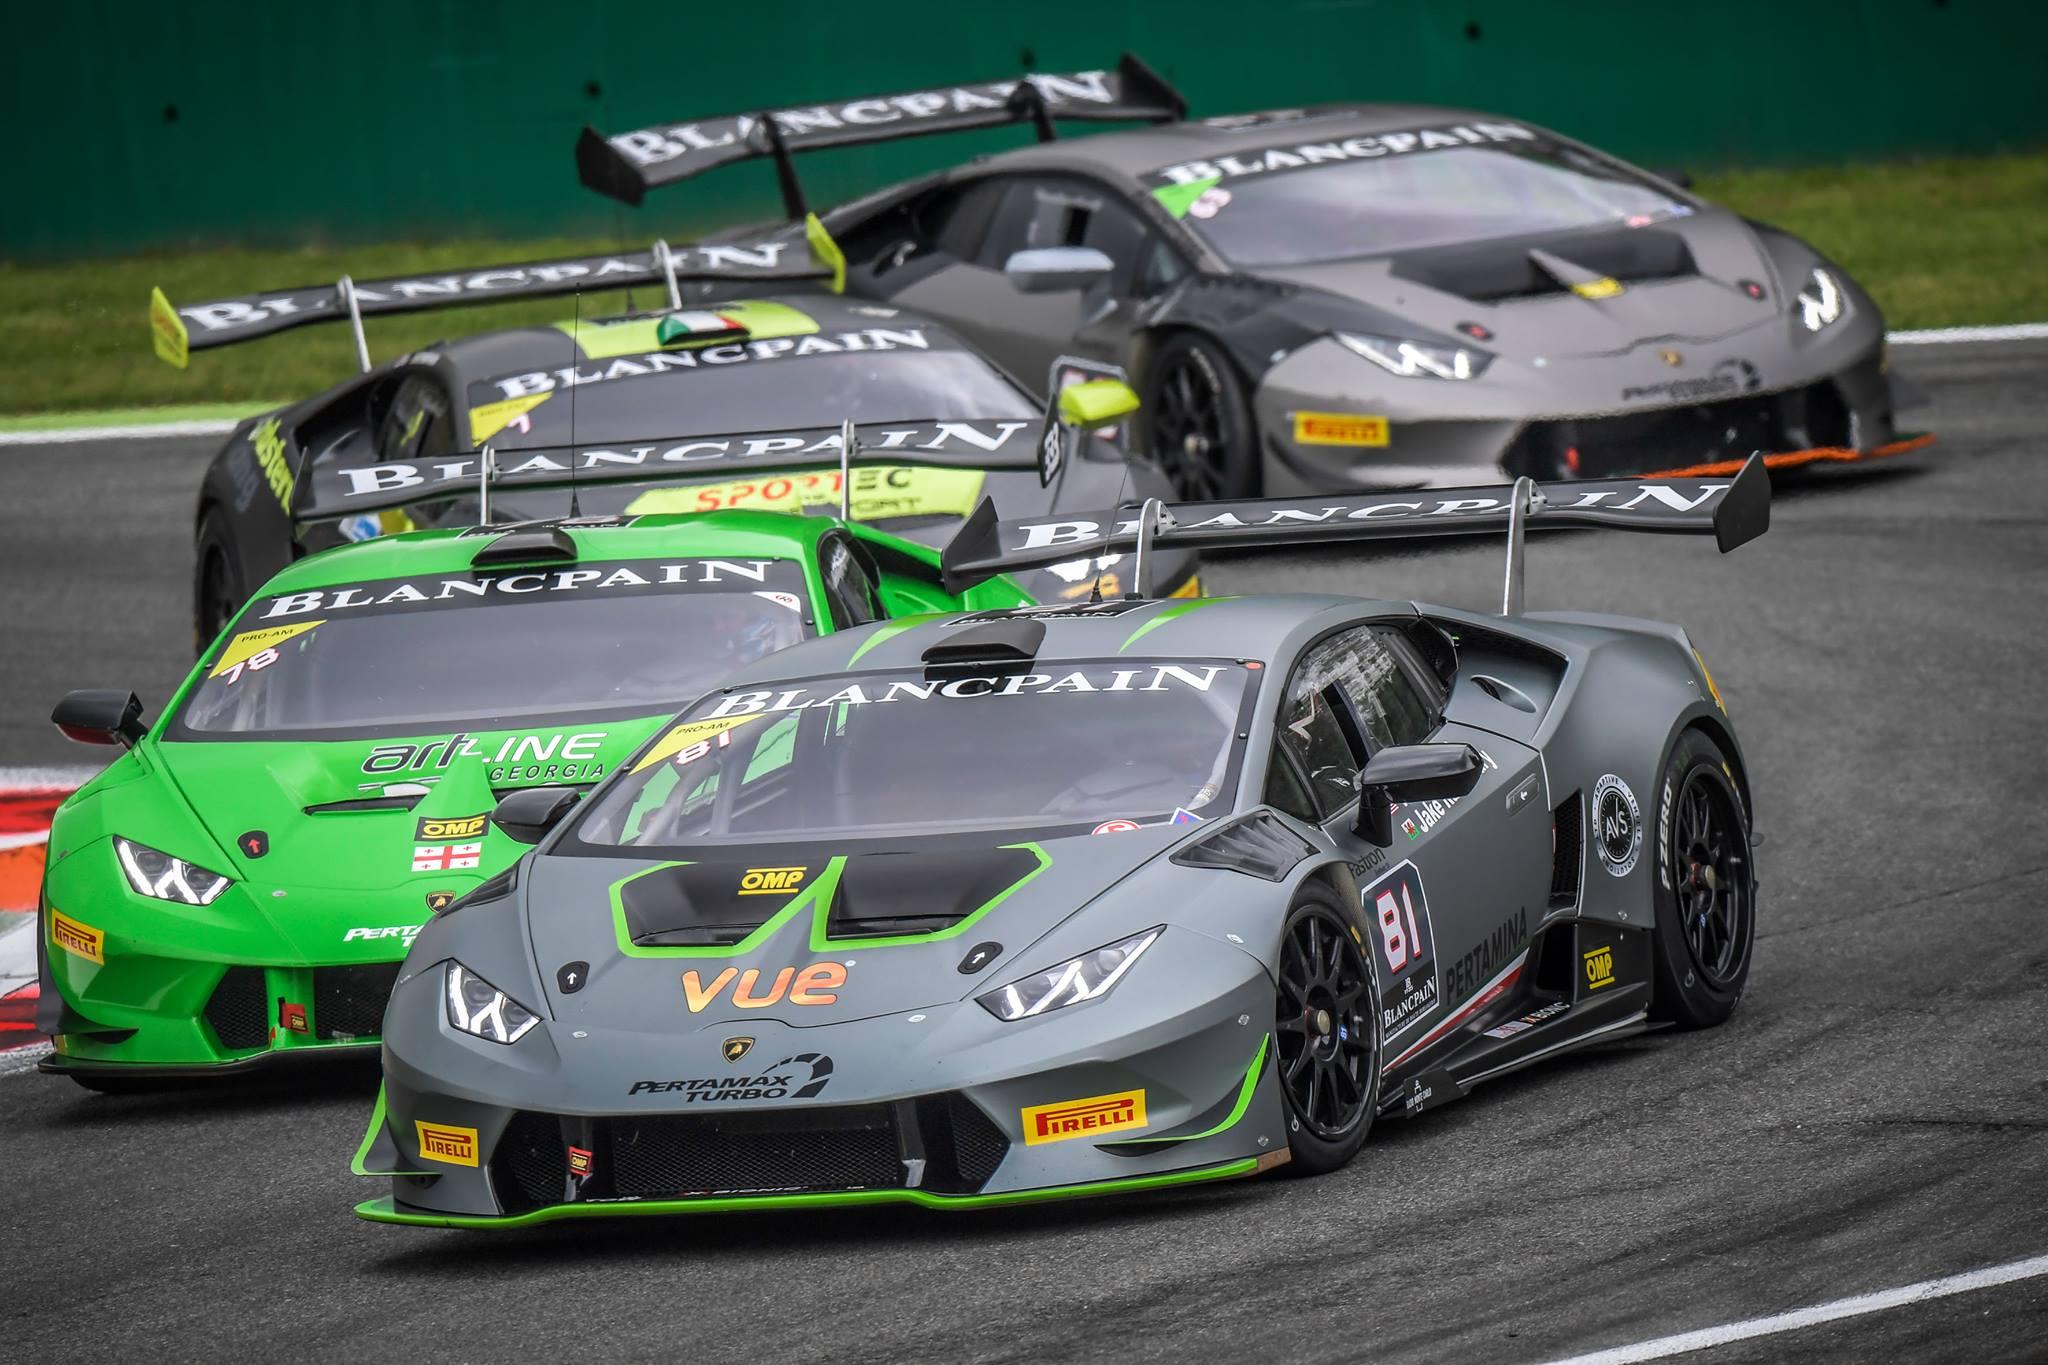 Lamborghini Blancpain Super Trofeo Monza 2016 Highlights